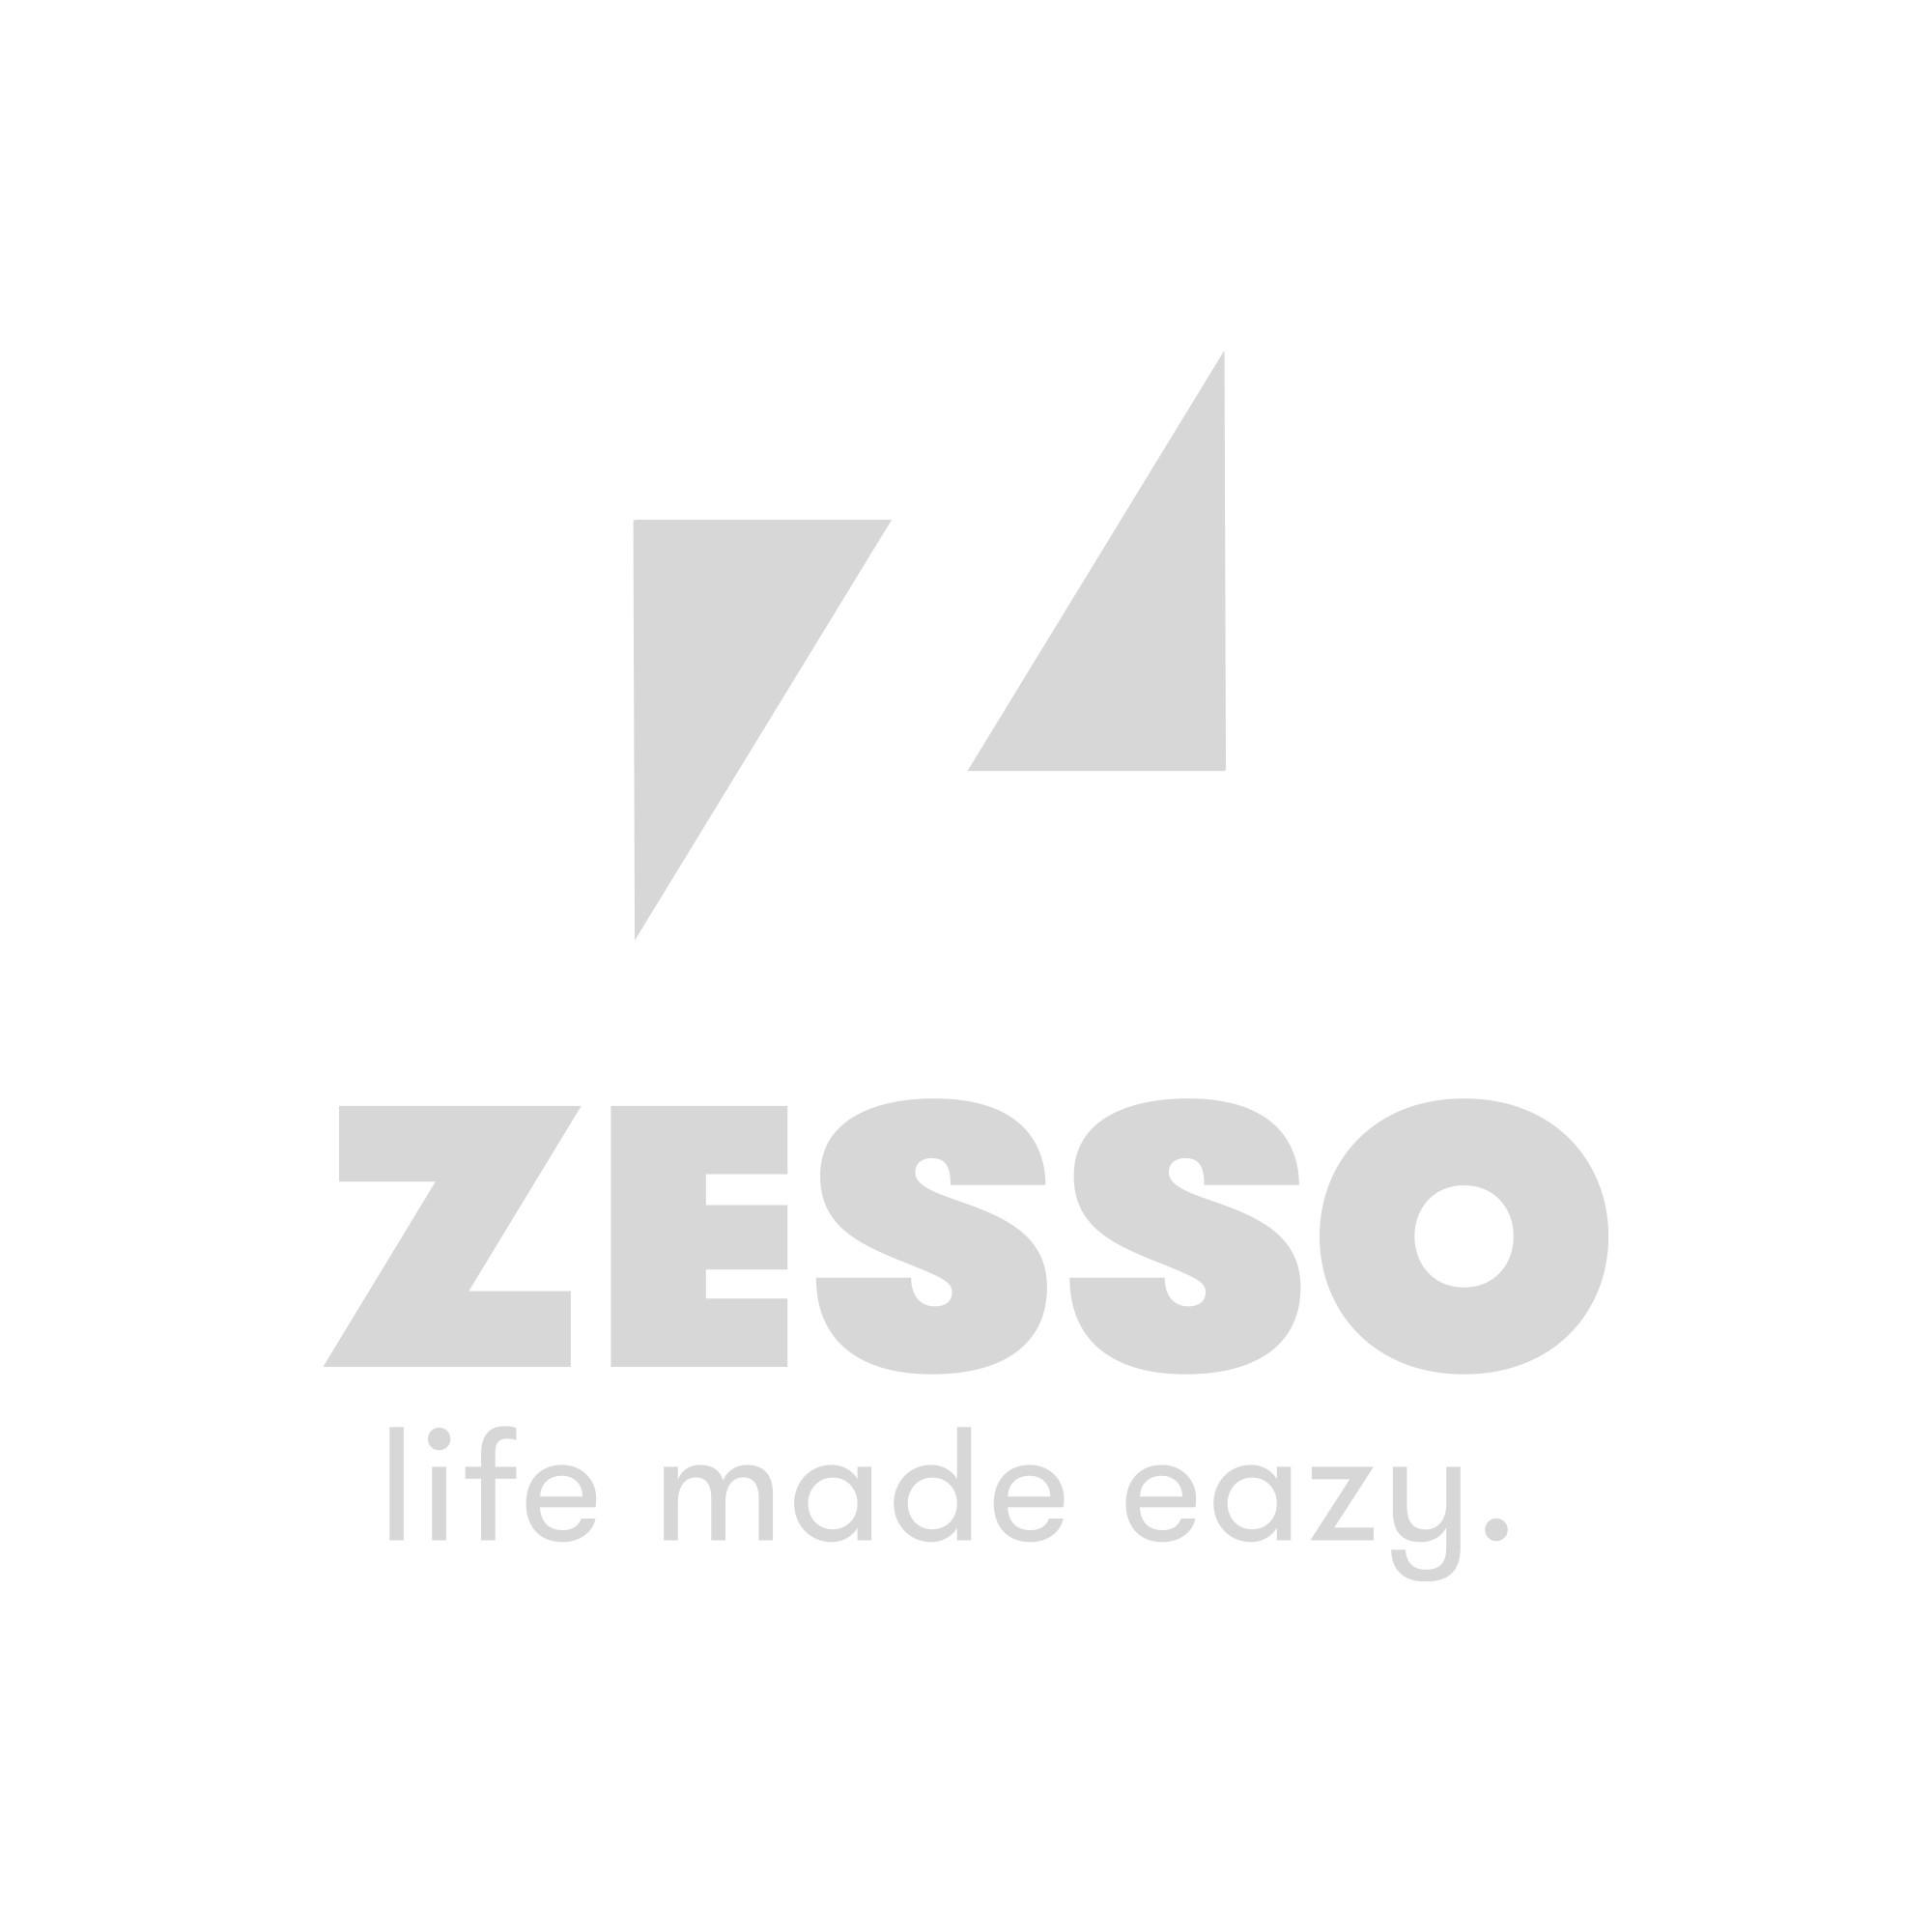 Baby'S Only Baby Gym Tapis De Jeu Argent / Gris / Blanc